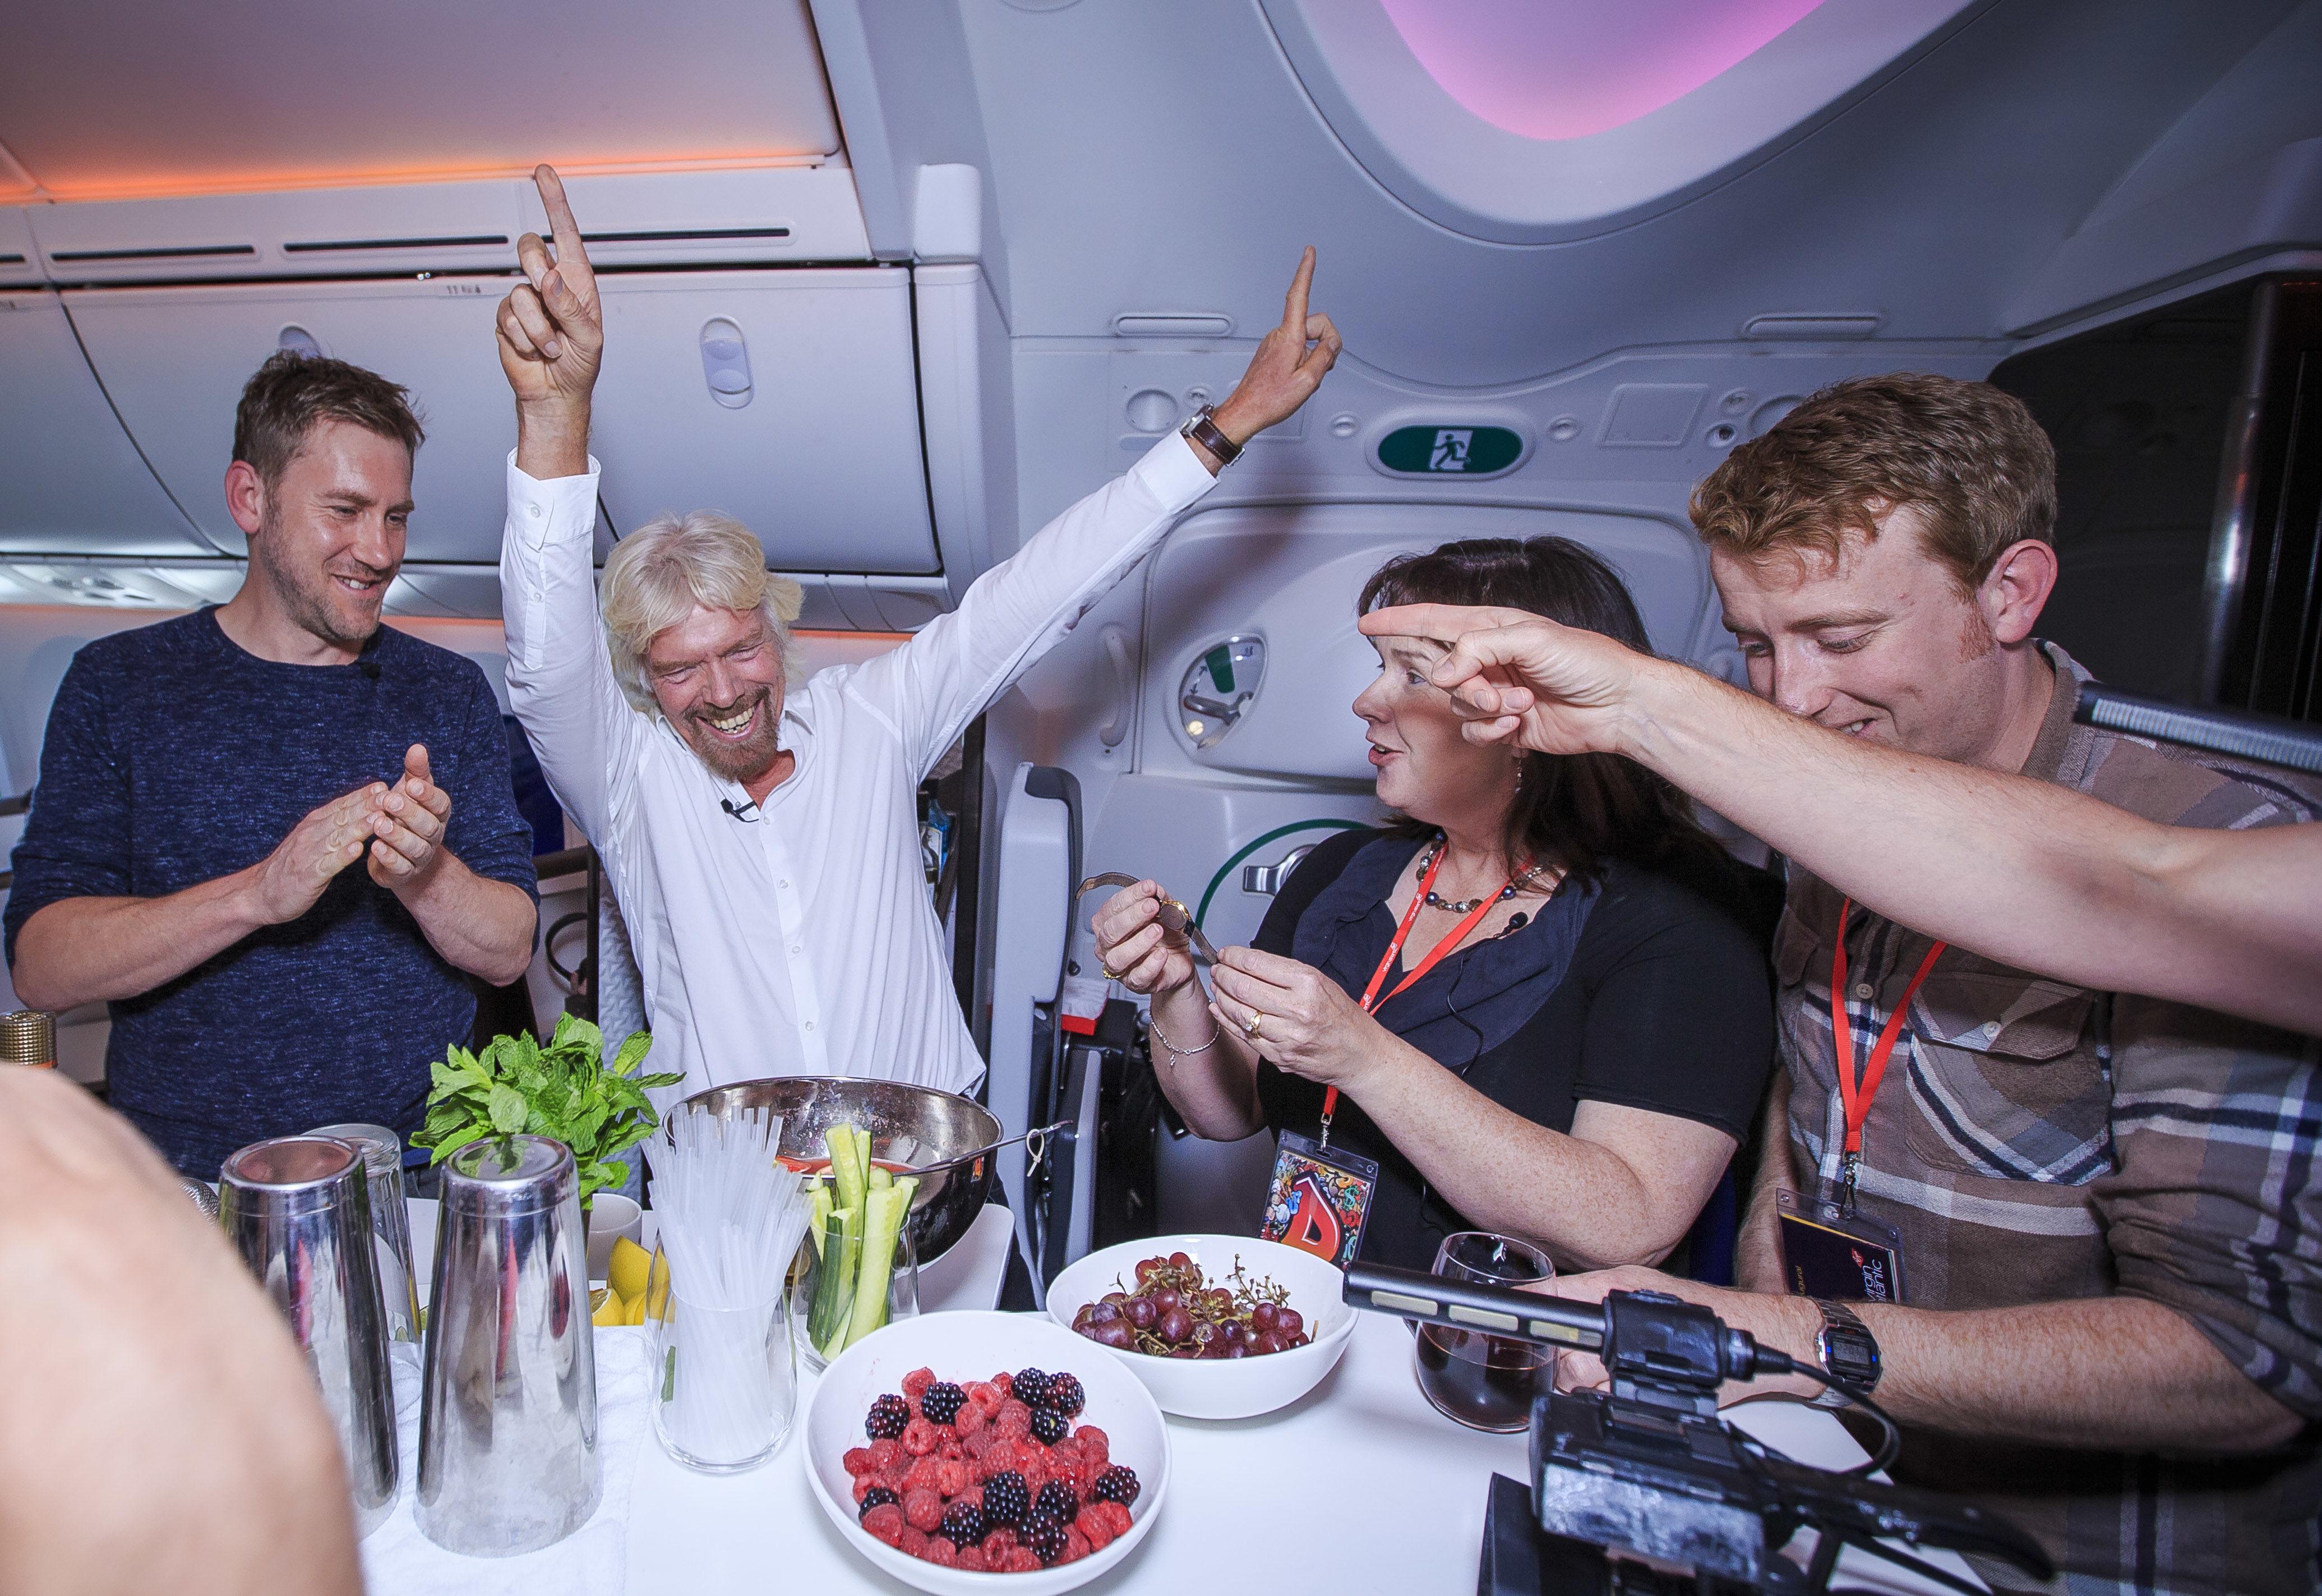 Richard Branson and Virgin StartUp on Virgin Atlantic flight to Detroit